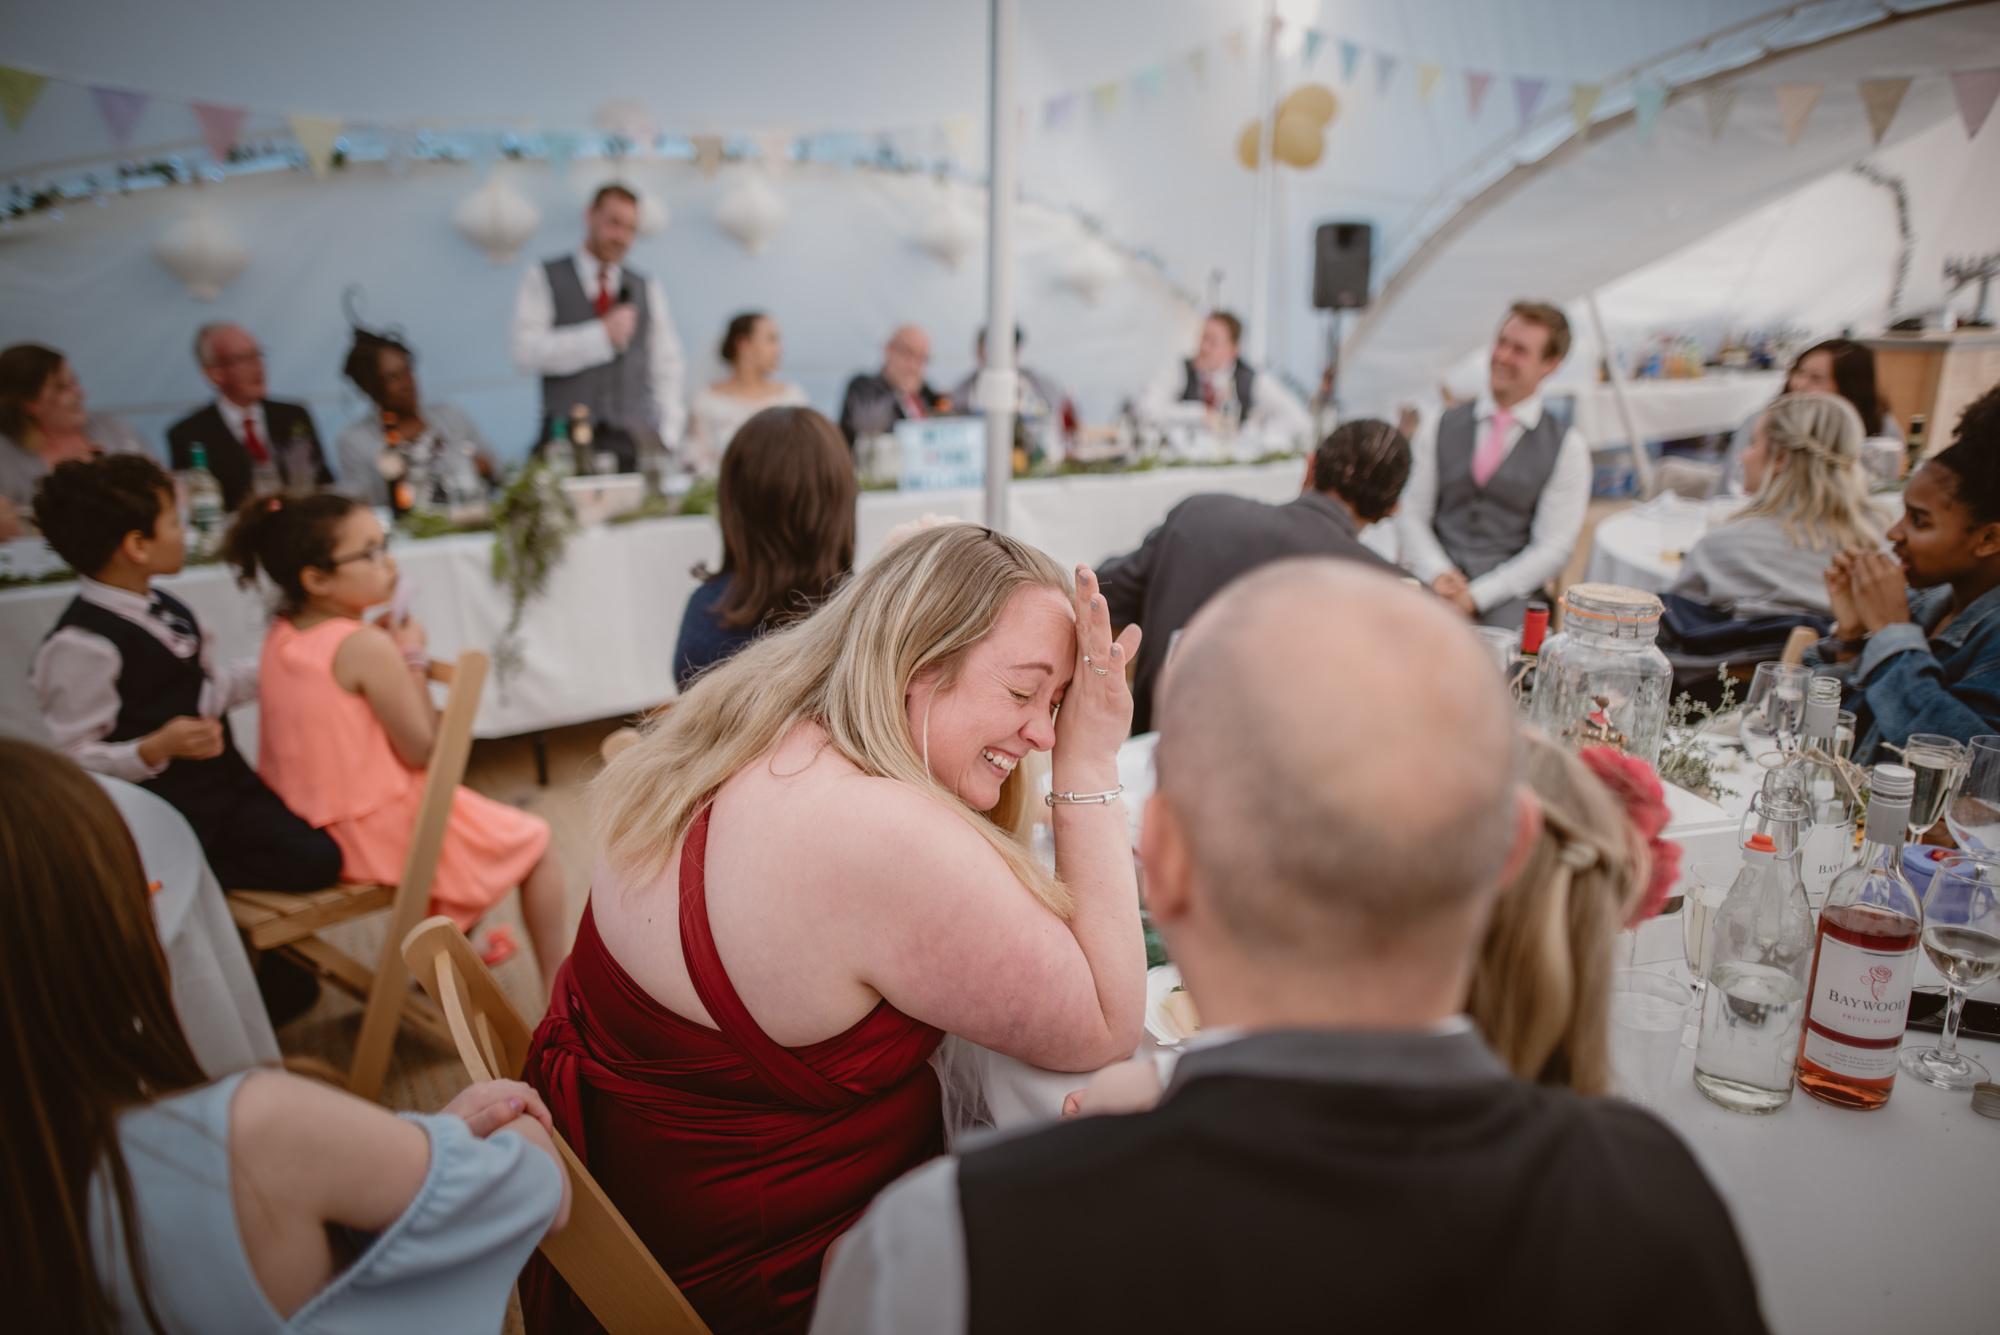 Jacqueline-Gareth-Wedding-Westmead-Events-Surrey-Manu-Mendoza-Wedding-Photography-415.jpg